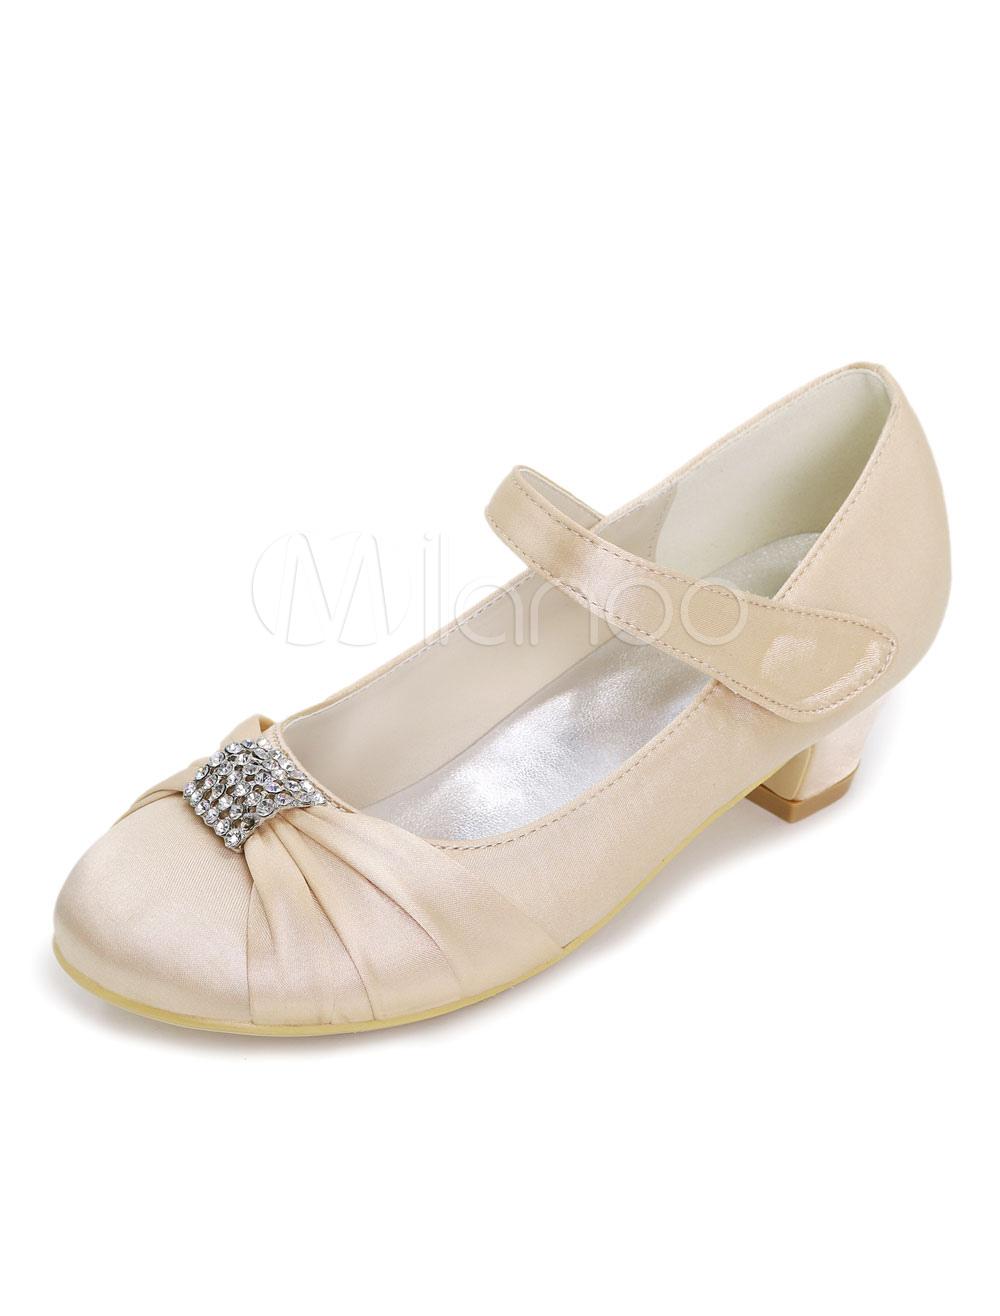 Rhinestones Flower Girl Pumps Pleated Champagne Wedding Shoes For Flower Girl thumbnail